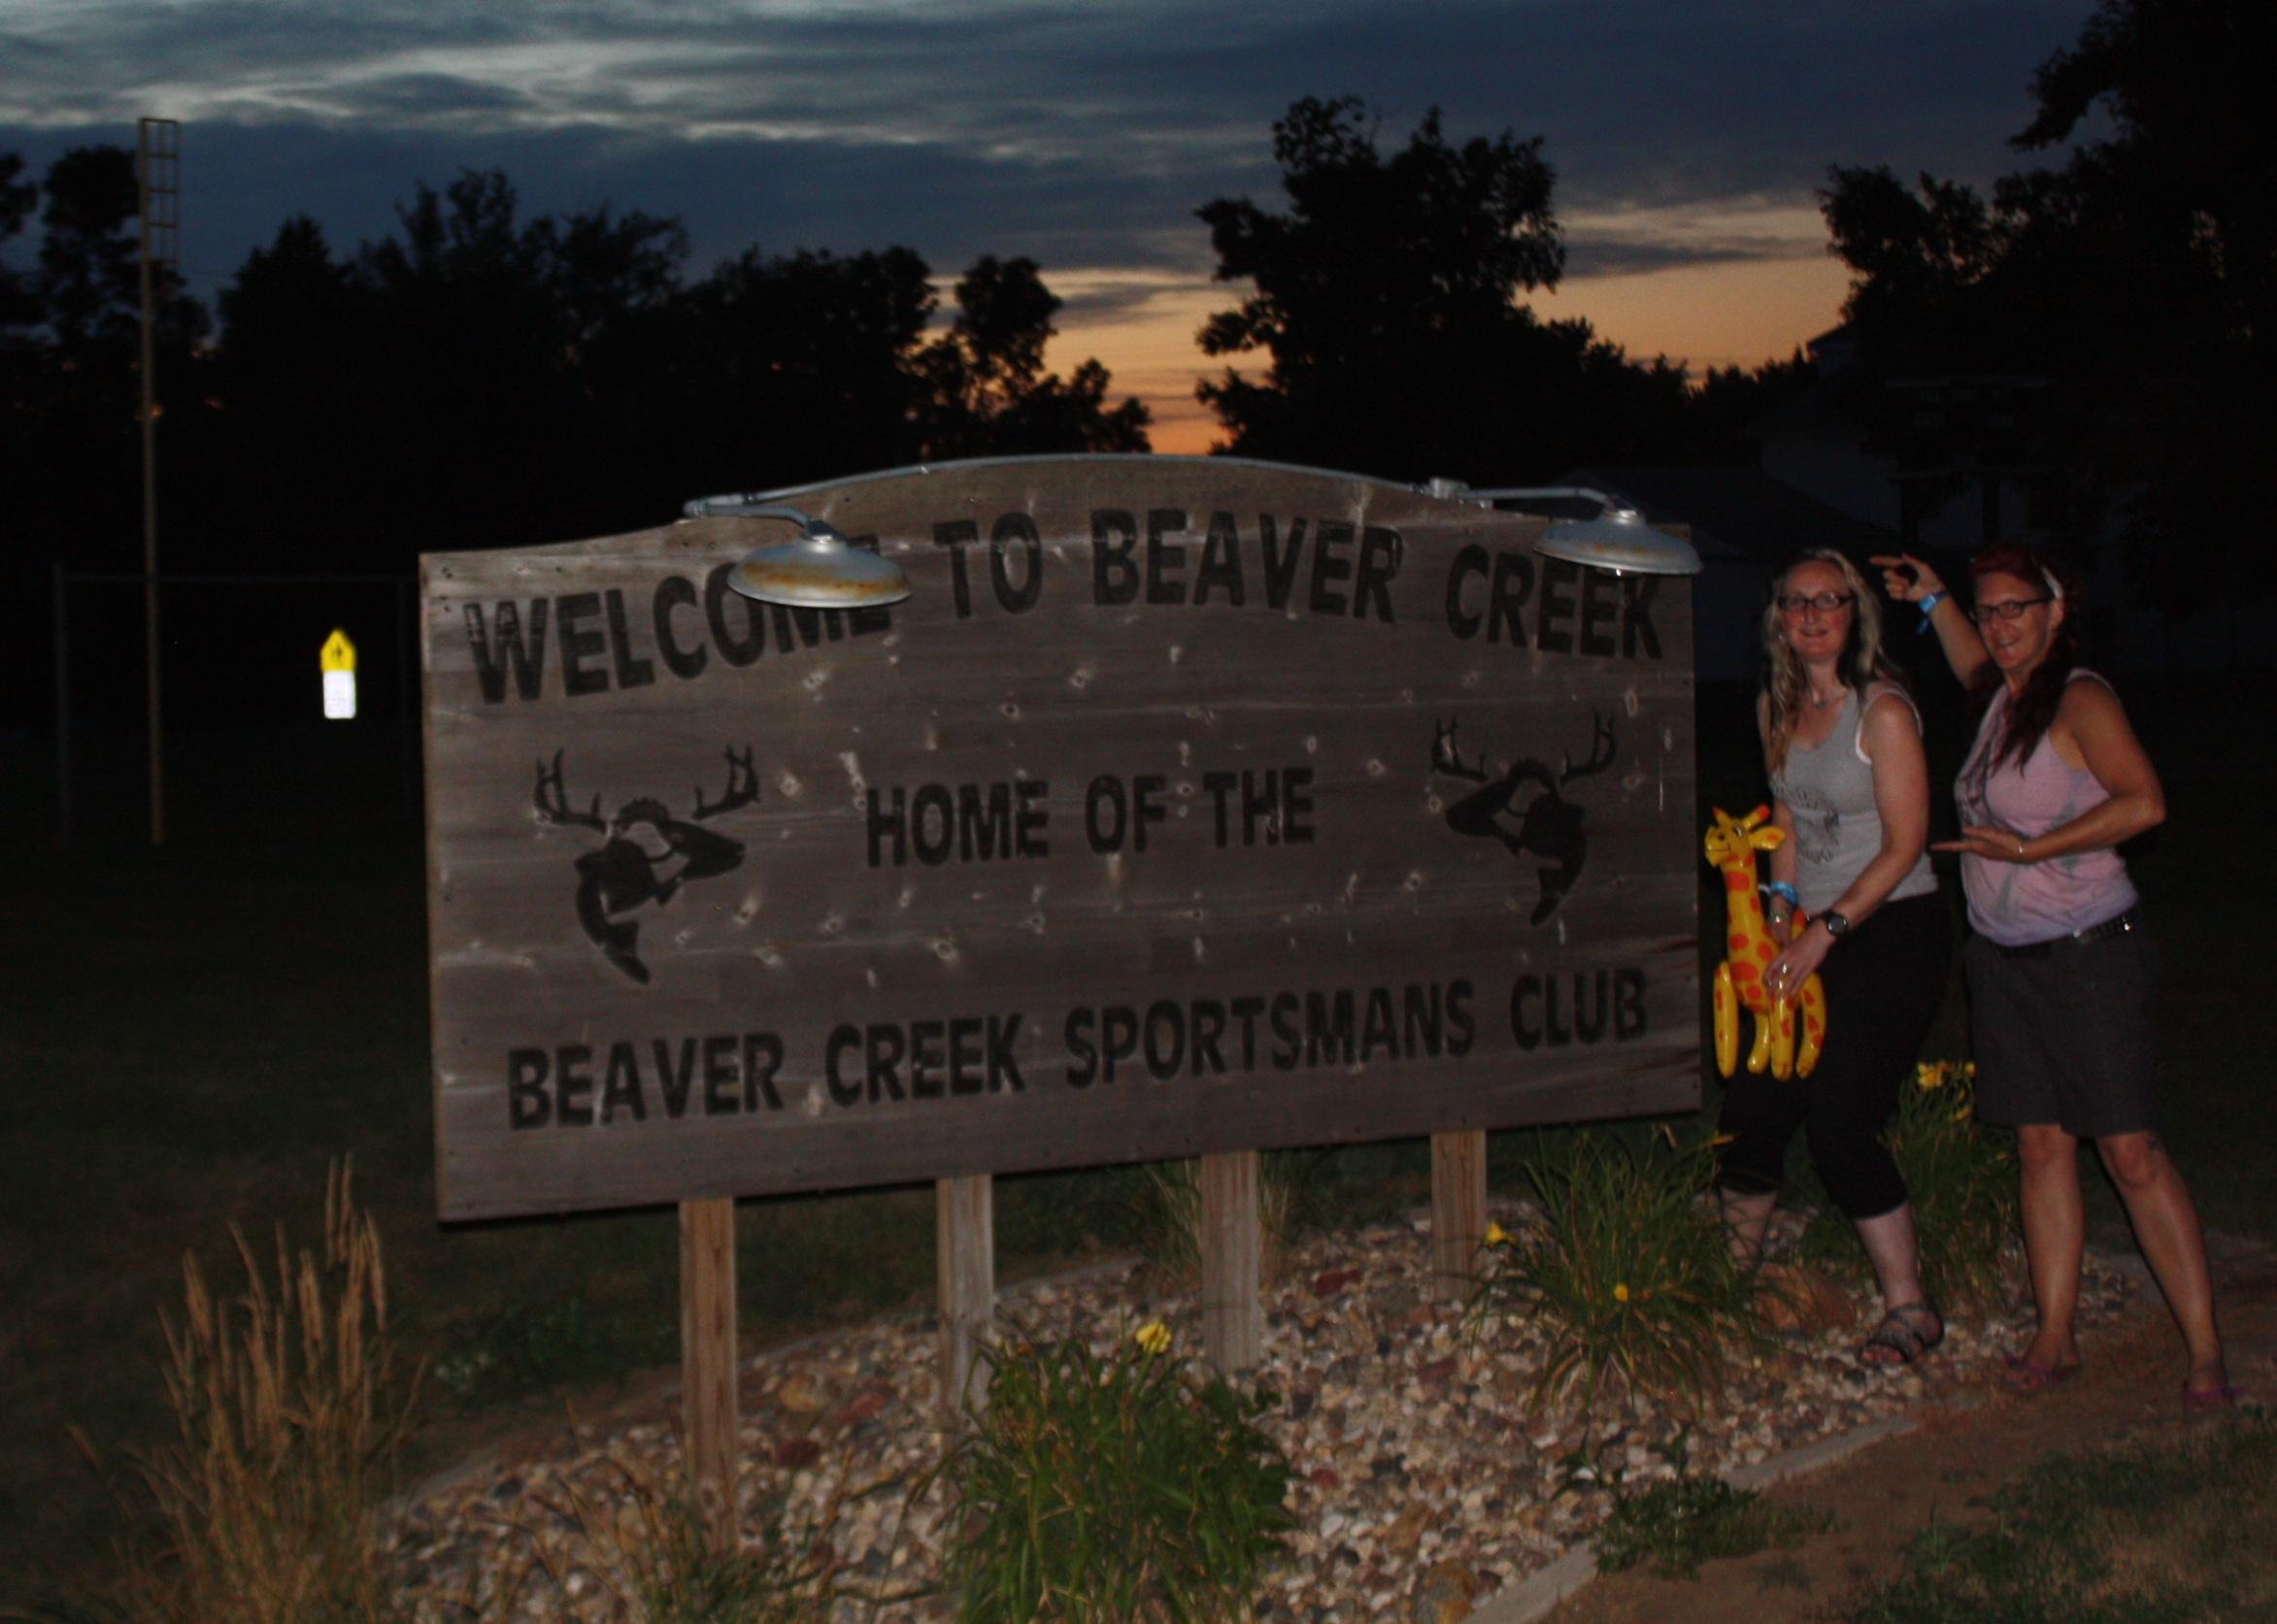 Beaver Creek, USA